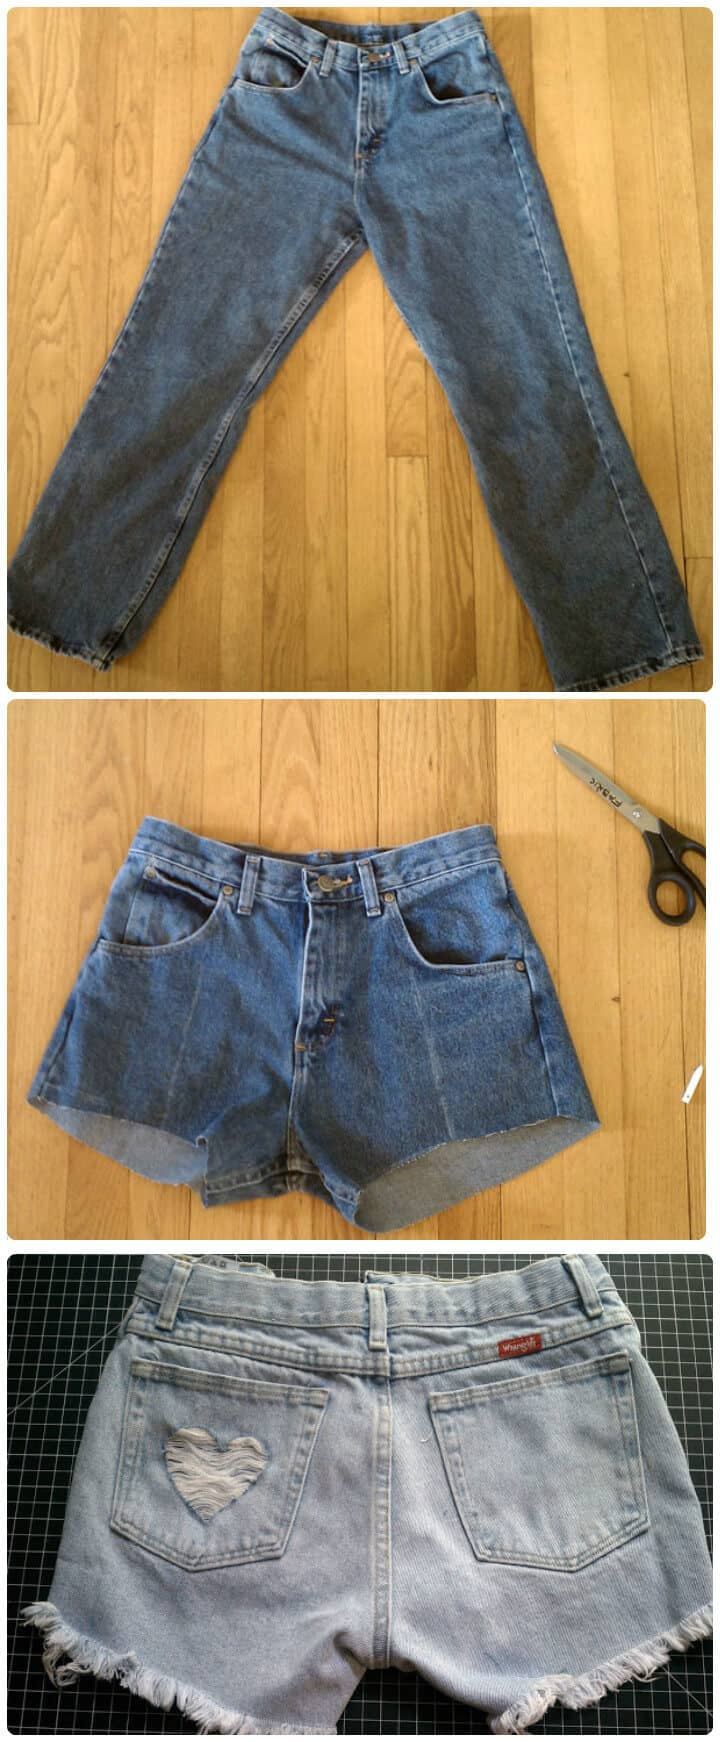 pantalones cortos de mezclilla viejos